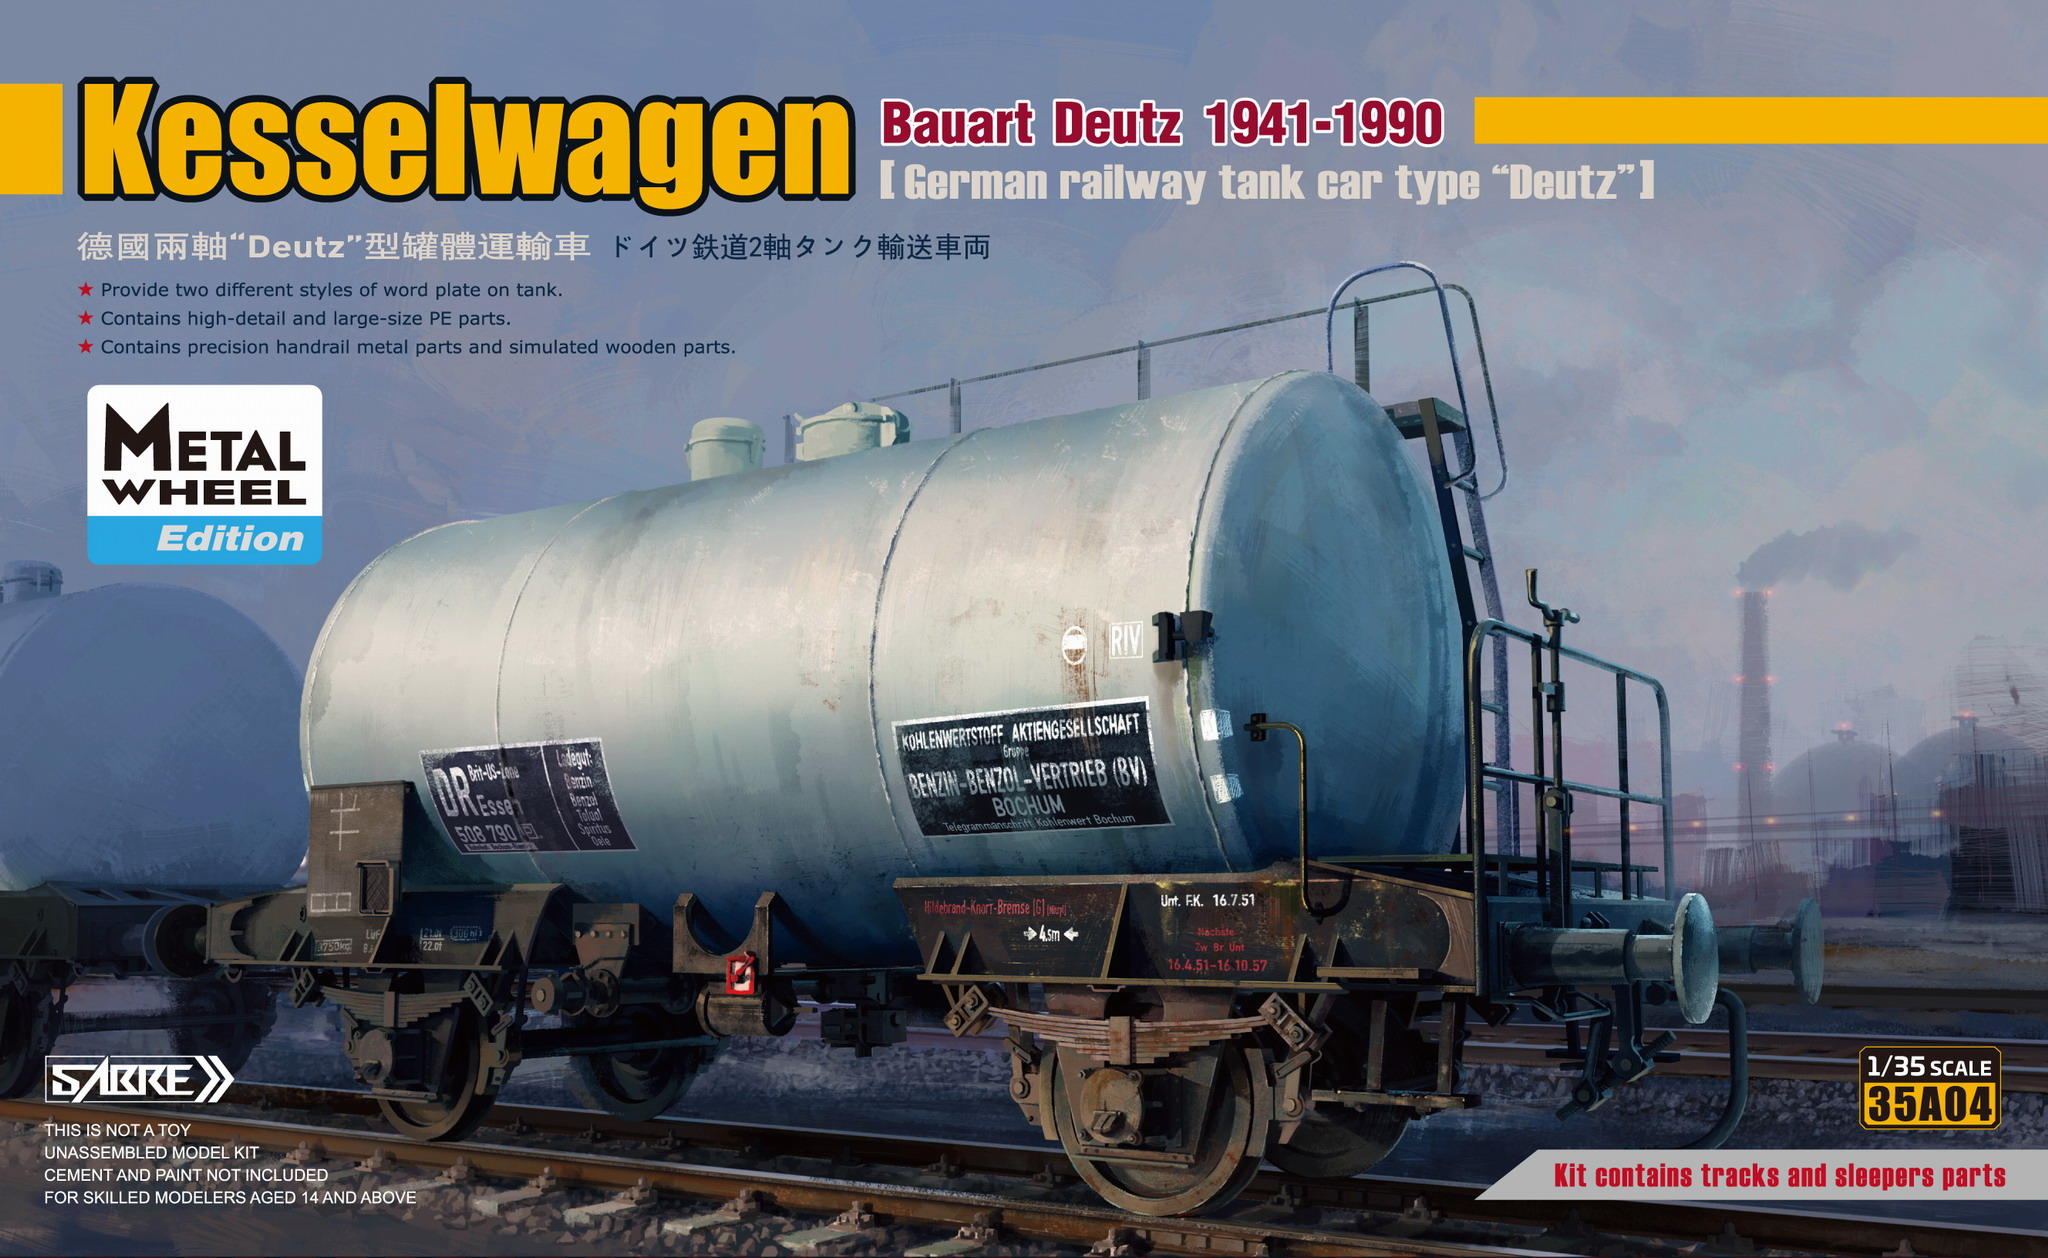 Kesselwagen- Bauart Deutz 1941-1990 Metal Wheels